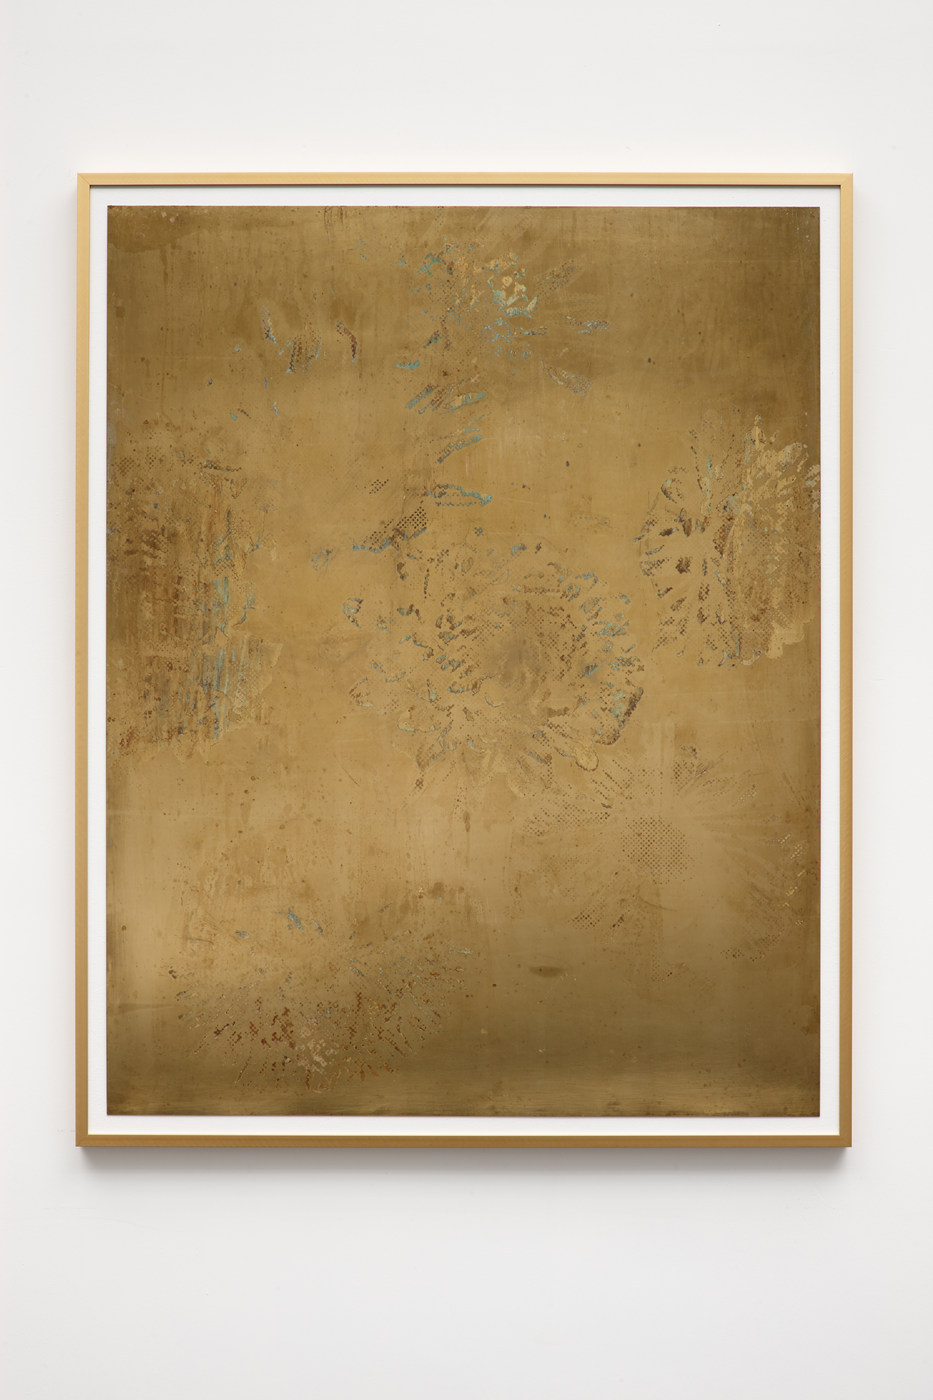 Ross Iannatti - E.C.E no. 40, 2016